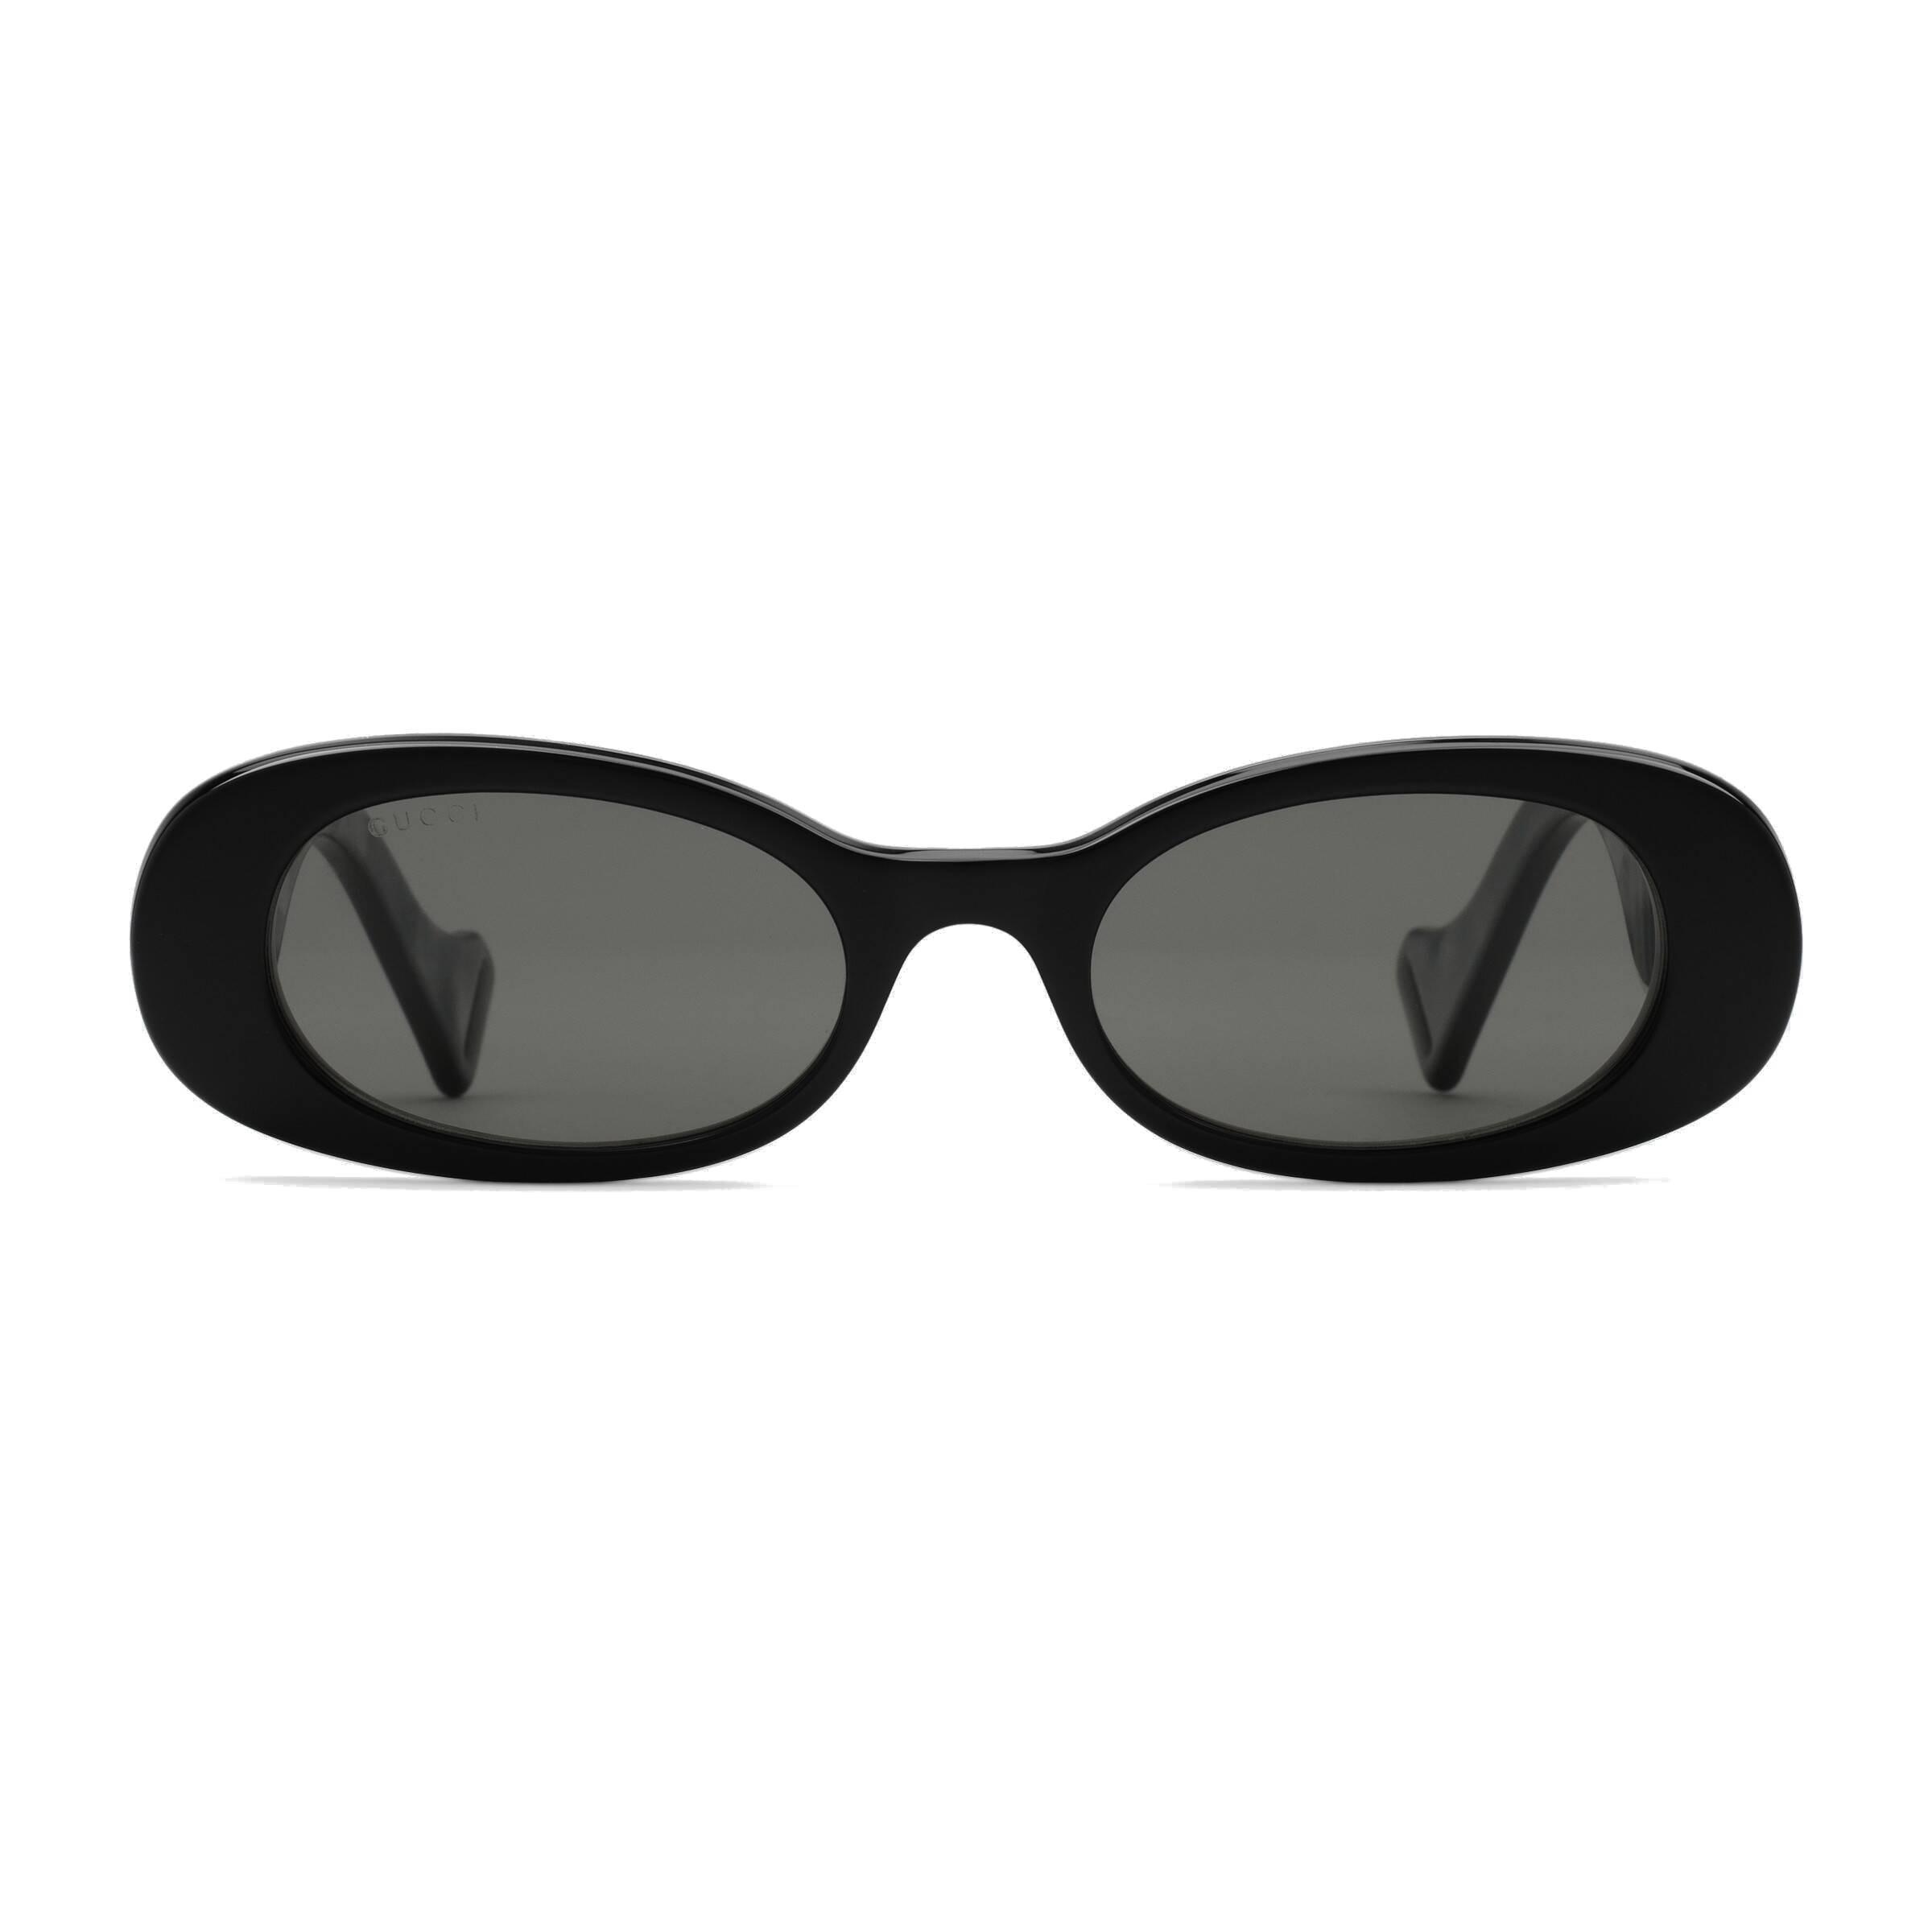 5084a83d5fcf Gucci - Oval Sunglasses - Black - Gucci Eyewear - Avvenice